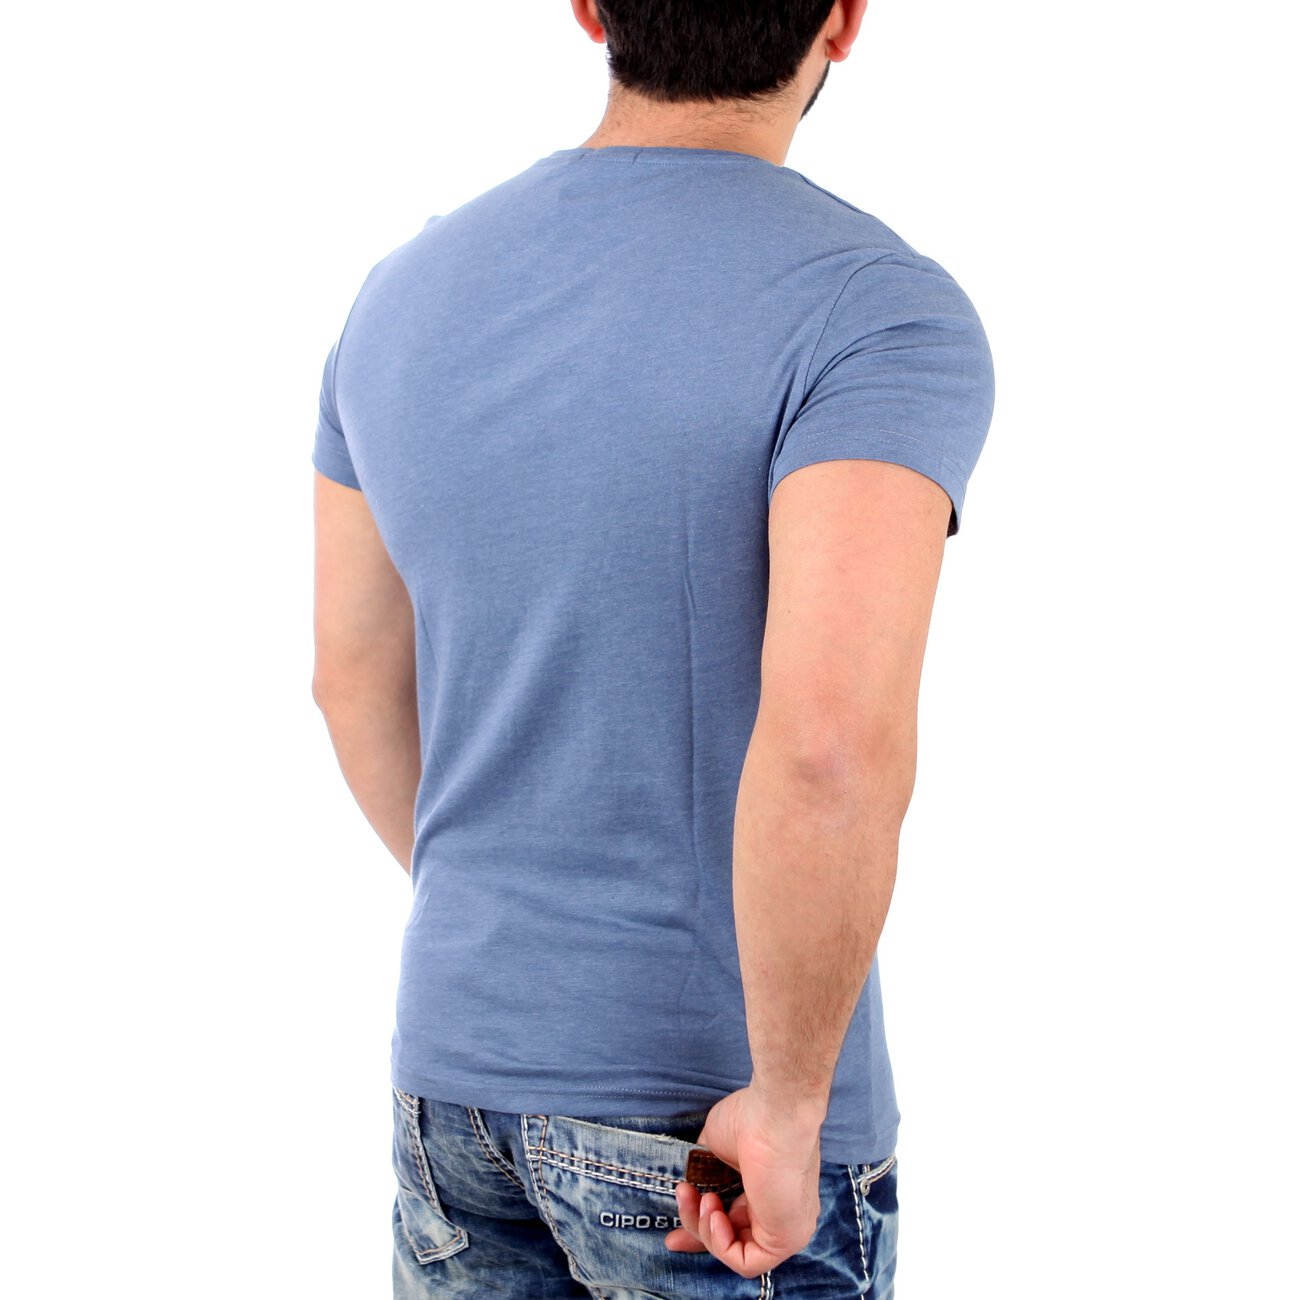 Reslad t shirt herren portland motiv print kurzarm shirt for T shirt printing in portland oregon